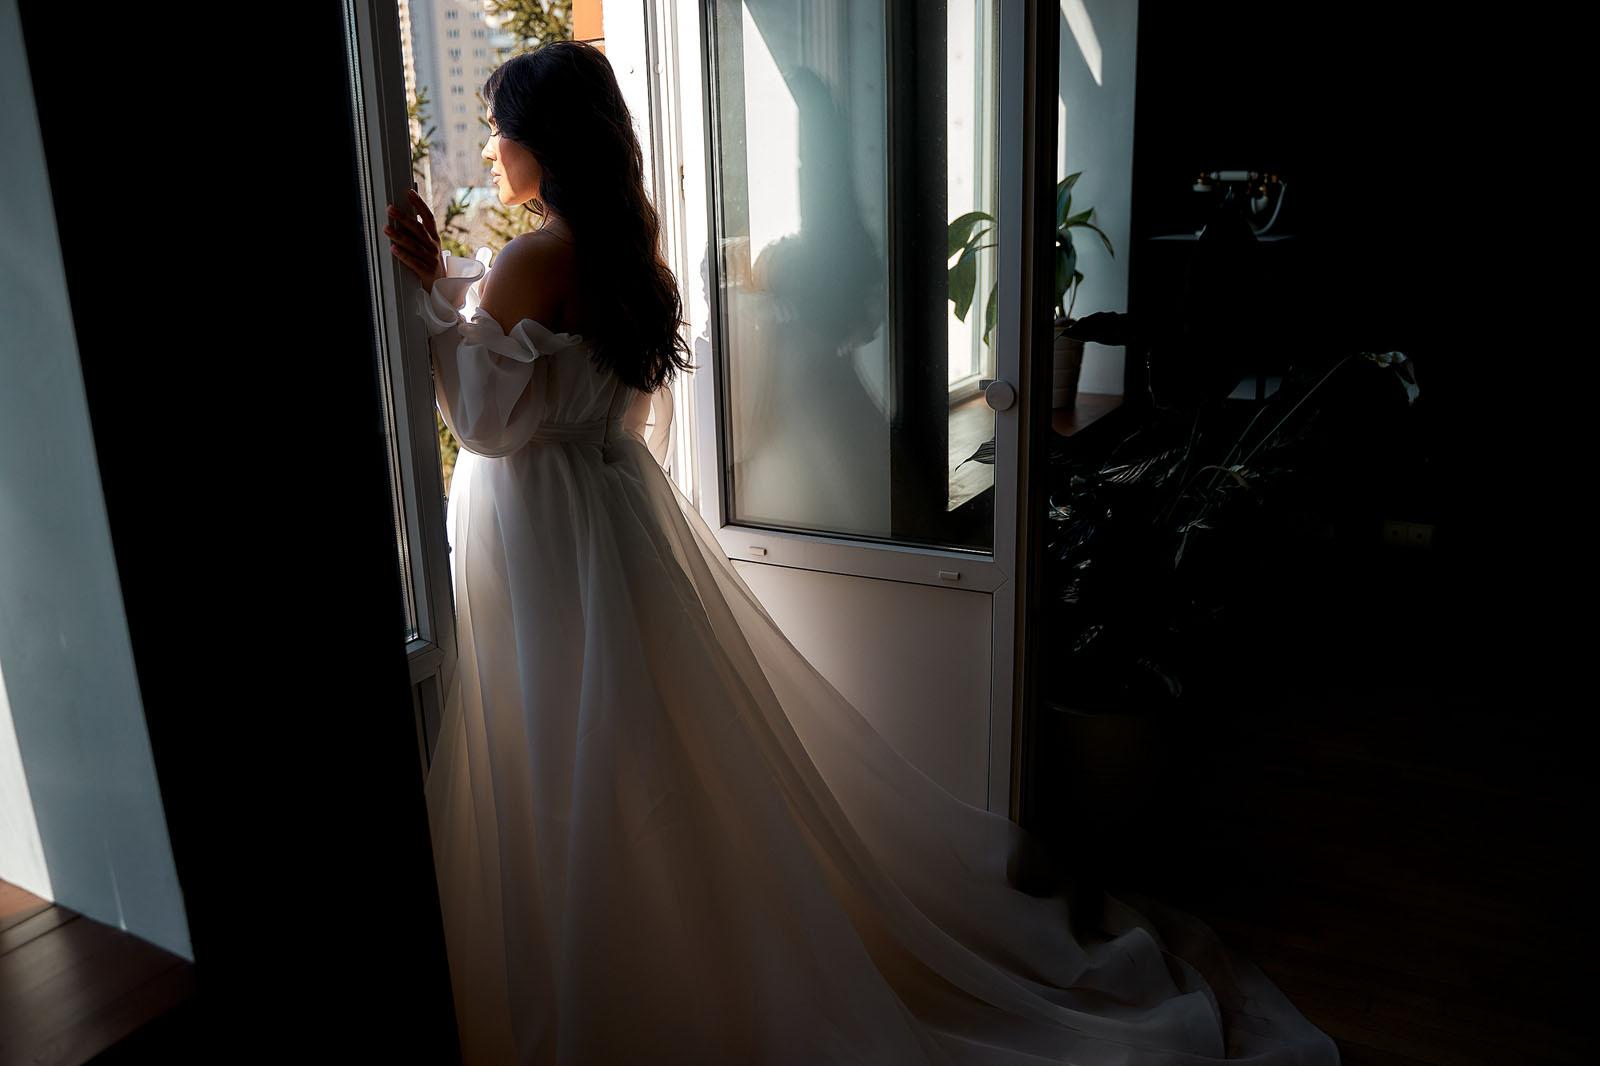 wedding@bekarev2021-04-10-11-14-29.jpg